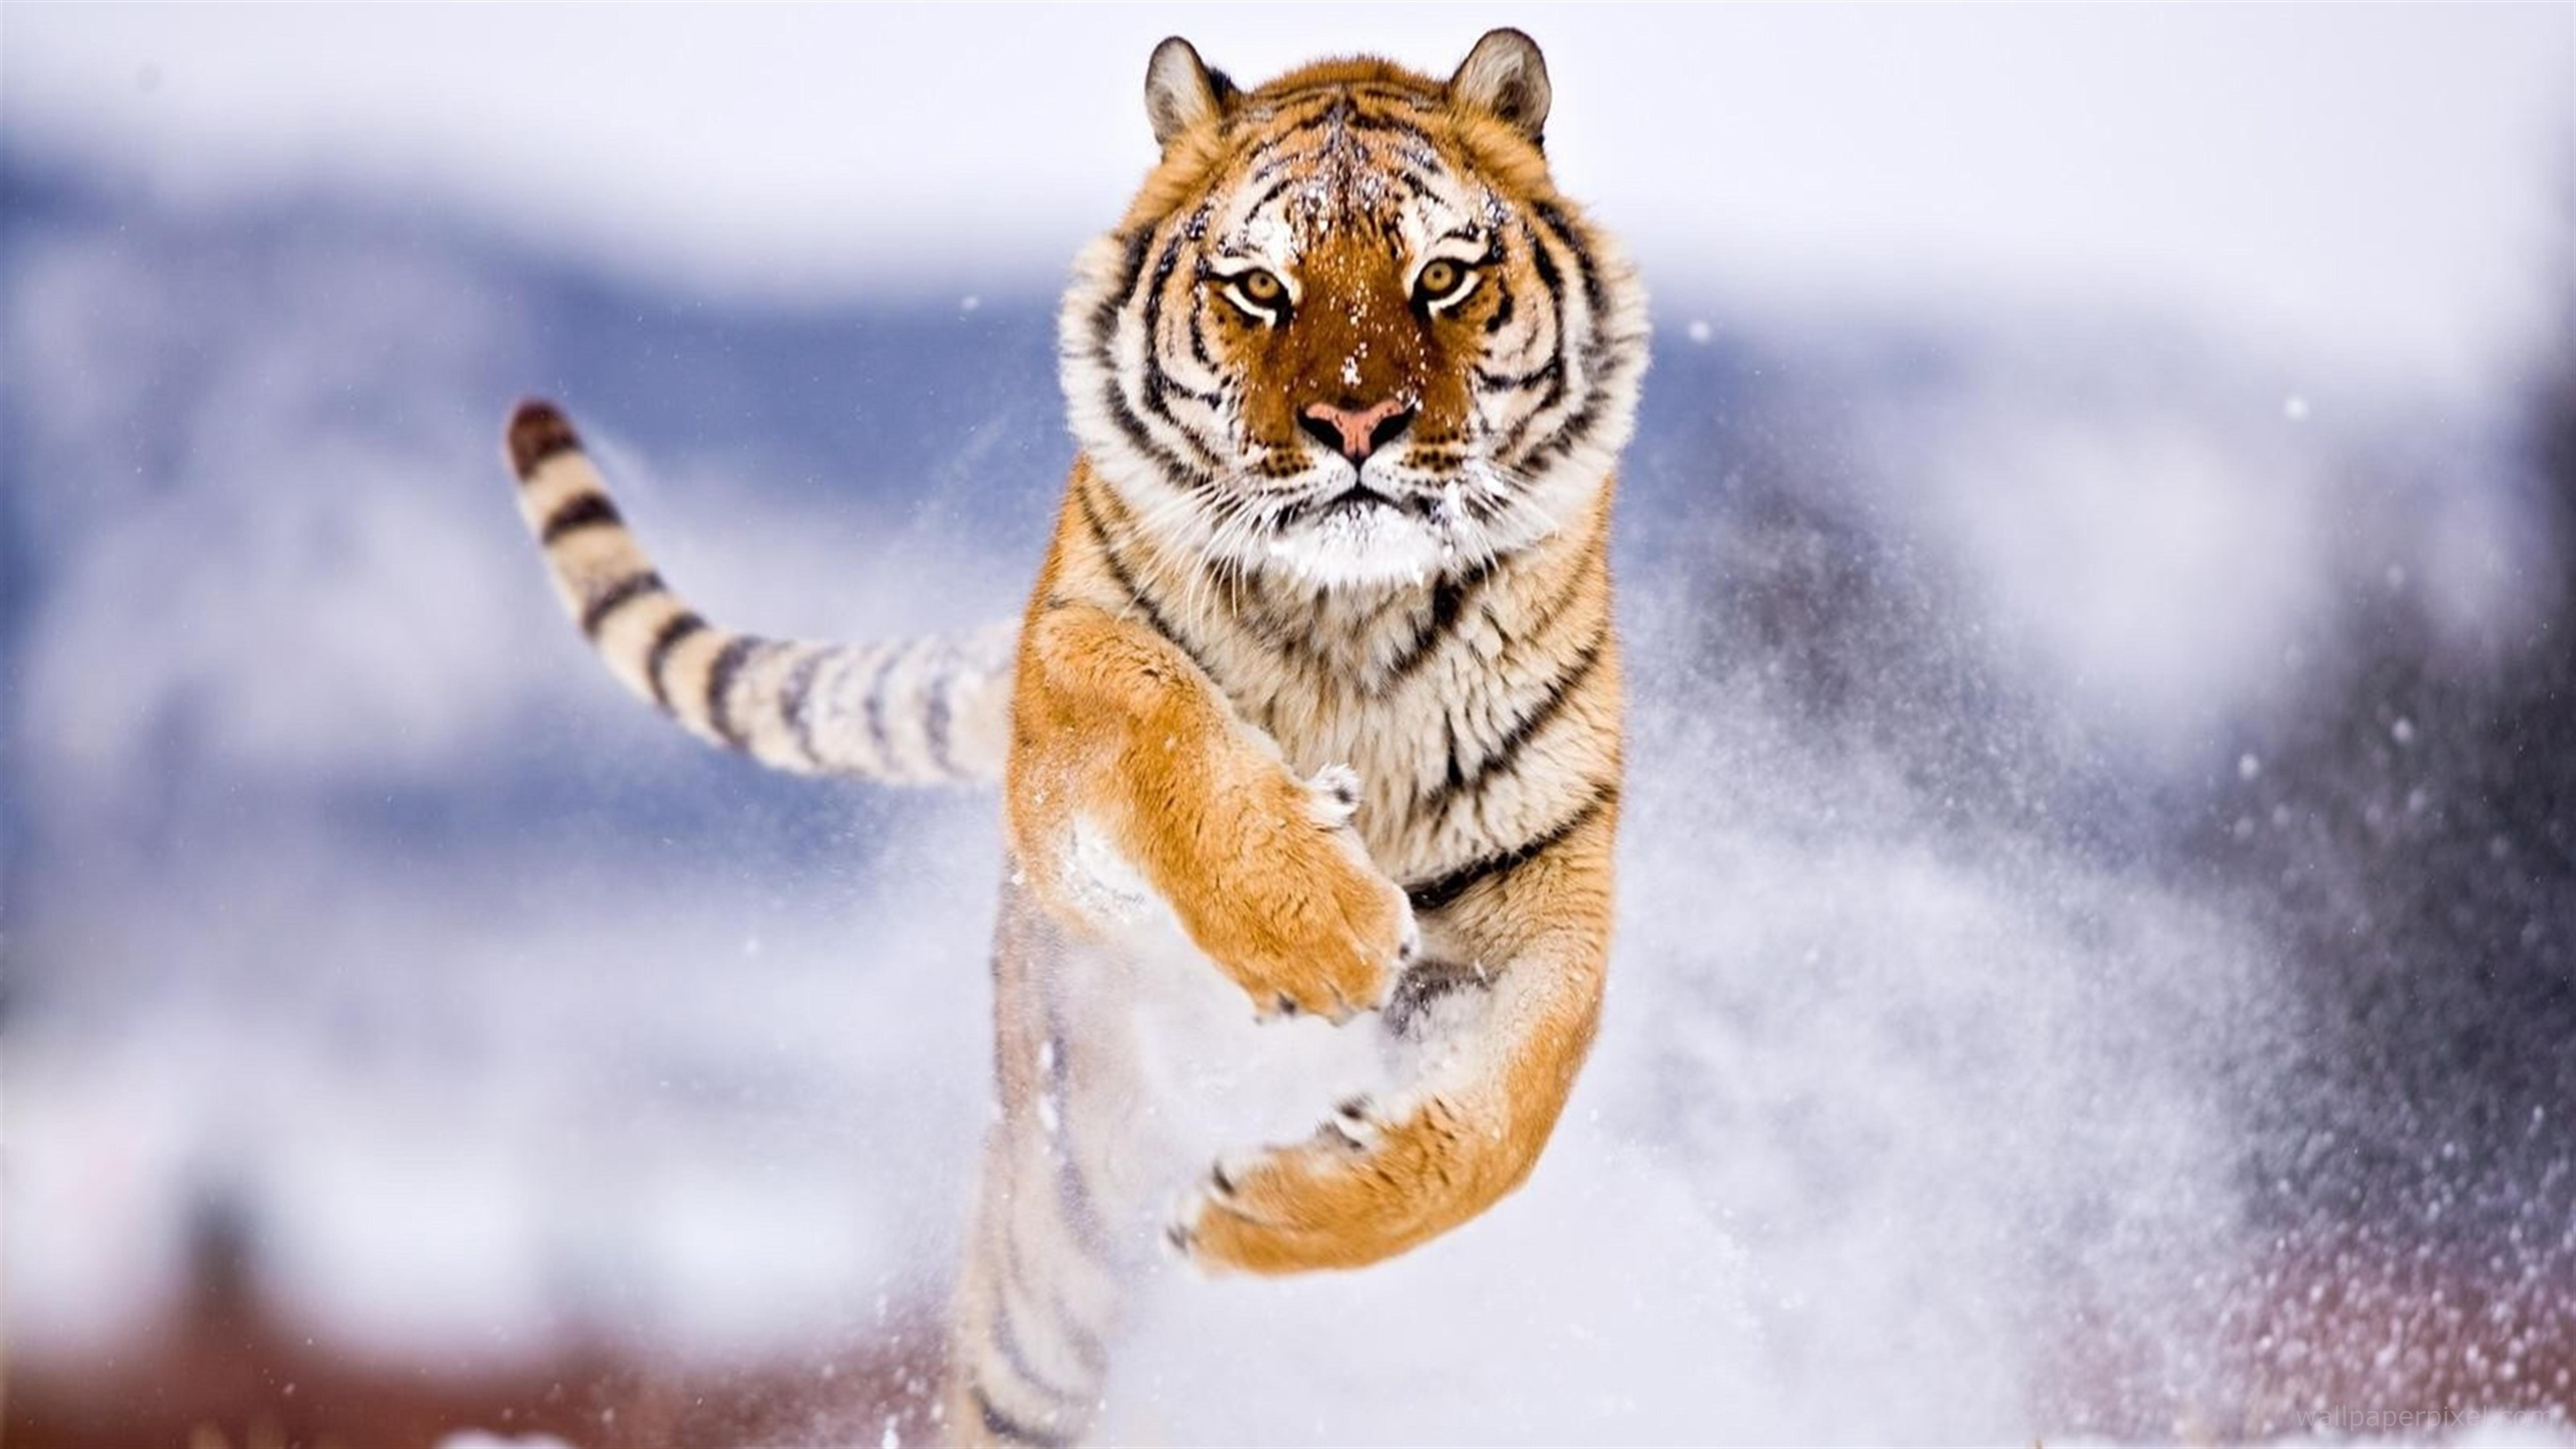 8k Animal Wallpaper Download: 7680x4320 Tiger In Snow 8k HD 4k Wallpapers, Images